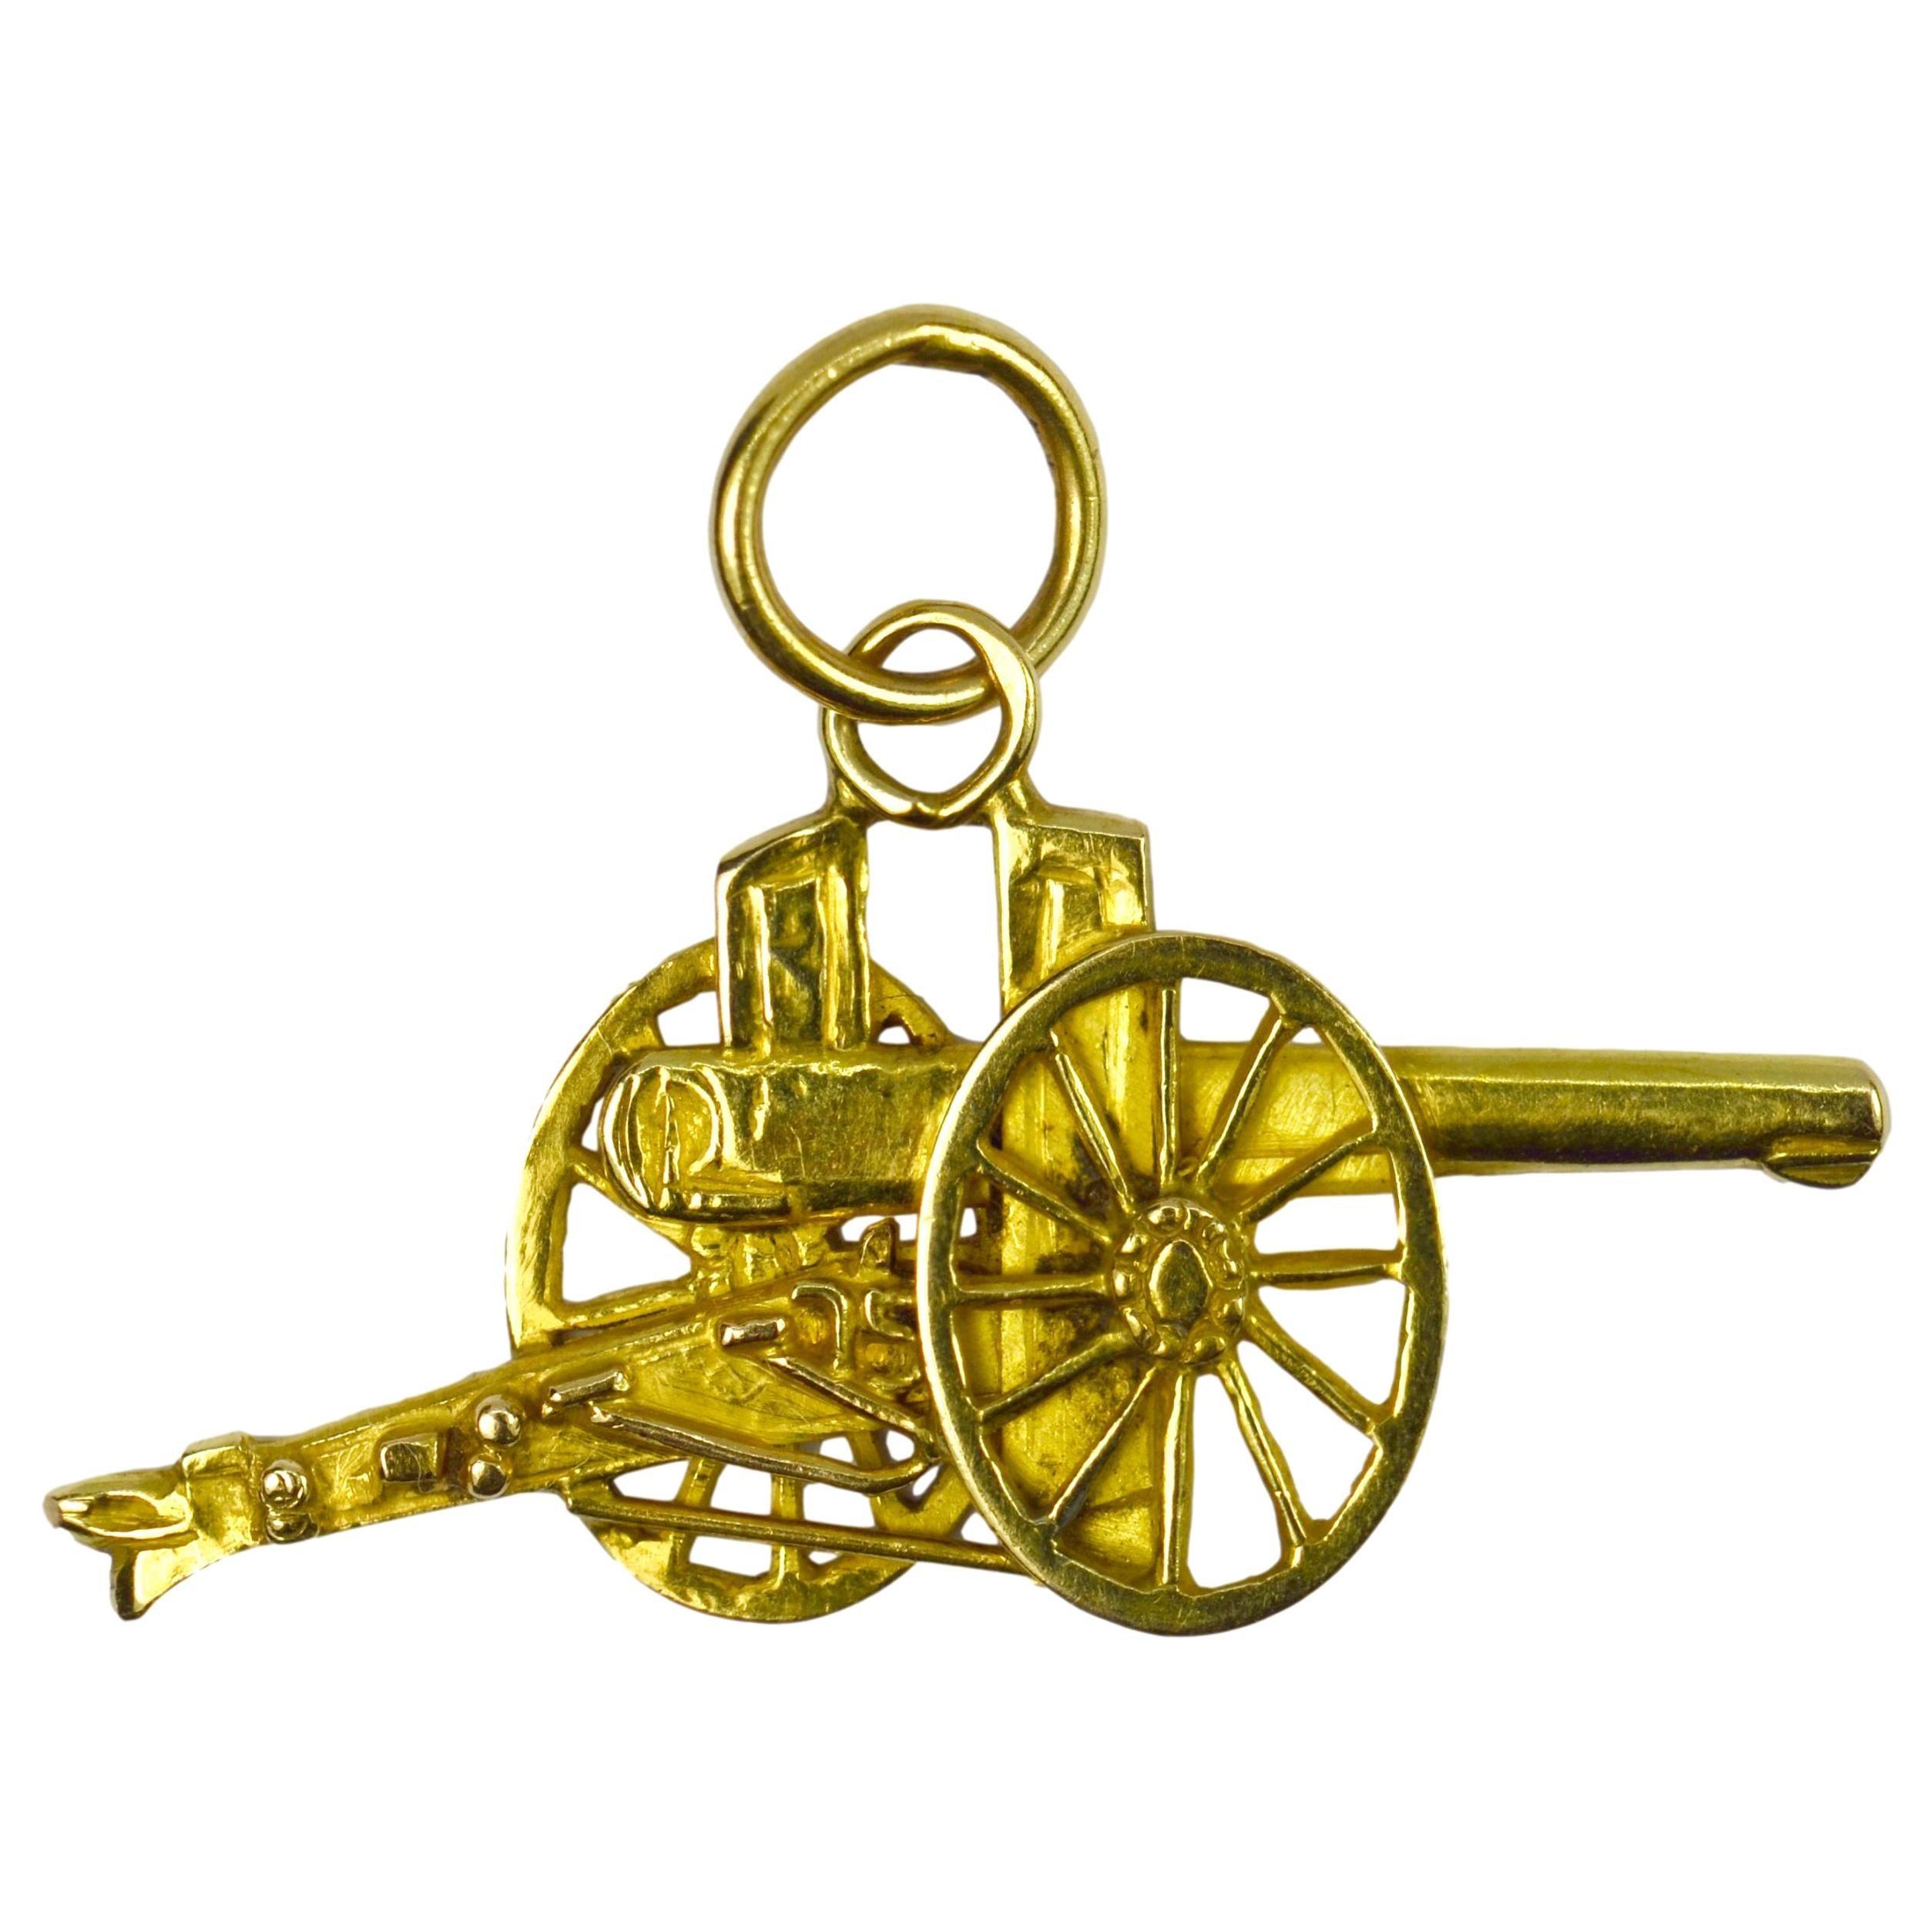 Cannon 18k Yellow Gold Charm Pendant